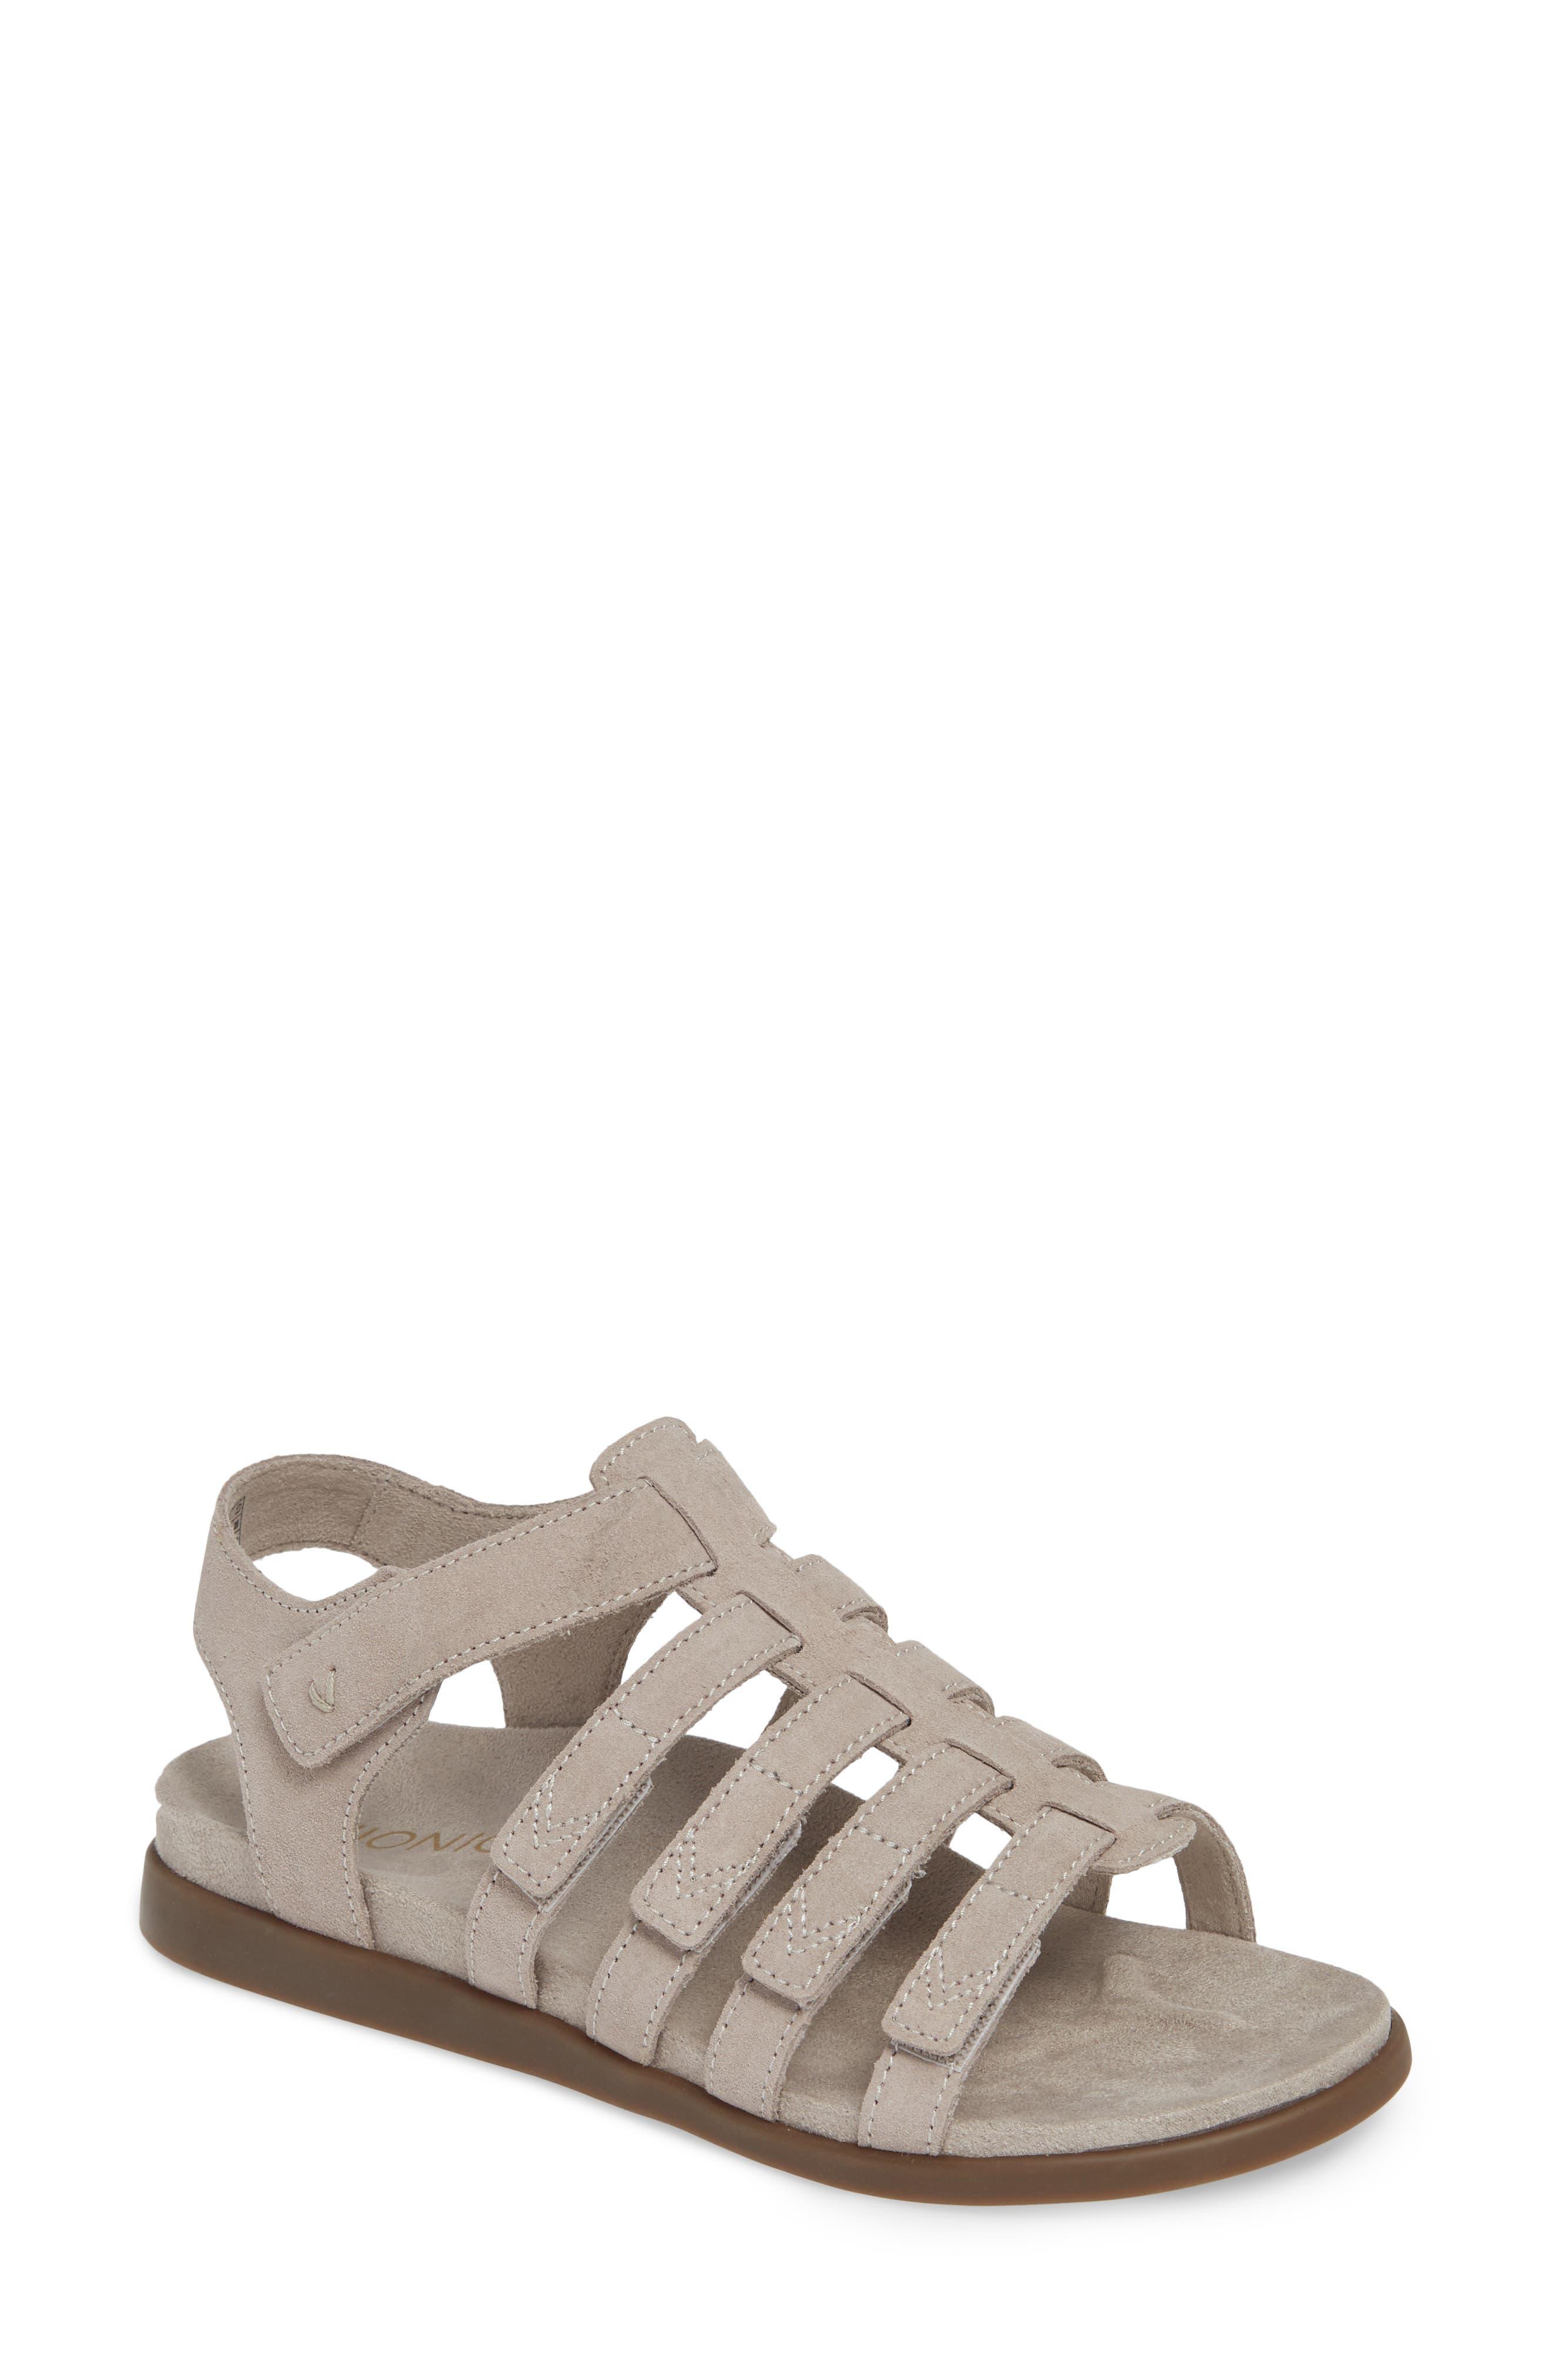 Vionic   Ritta Strappy Sandal